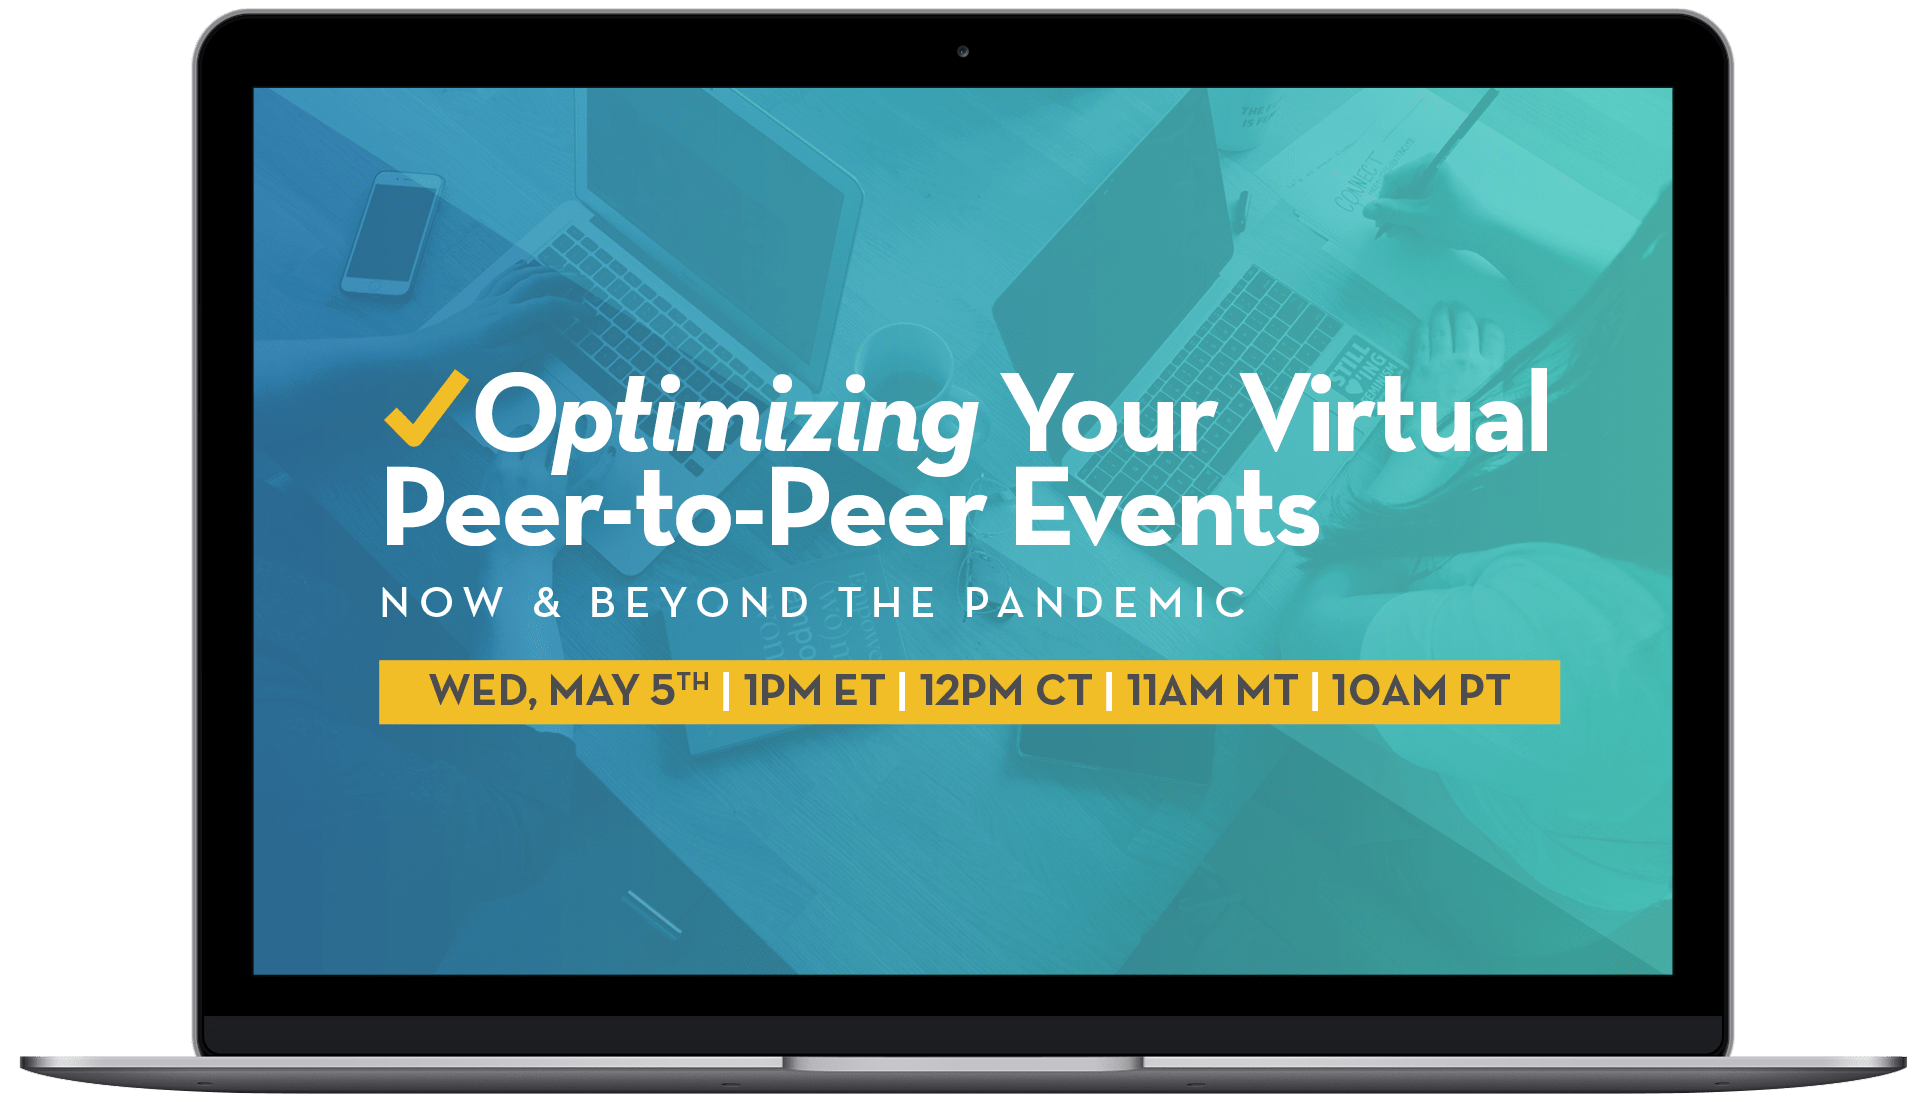 Optimize your Virtual Peer-to-Peer laptop